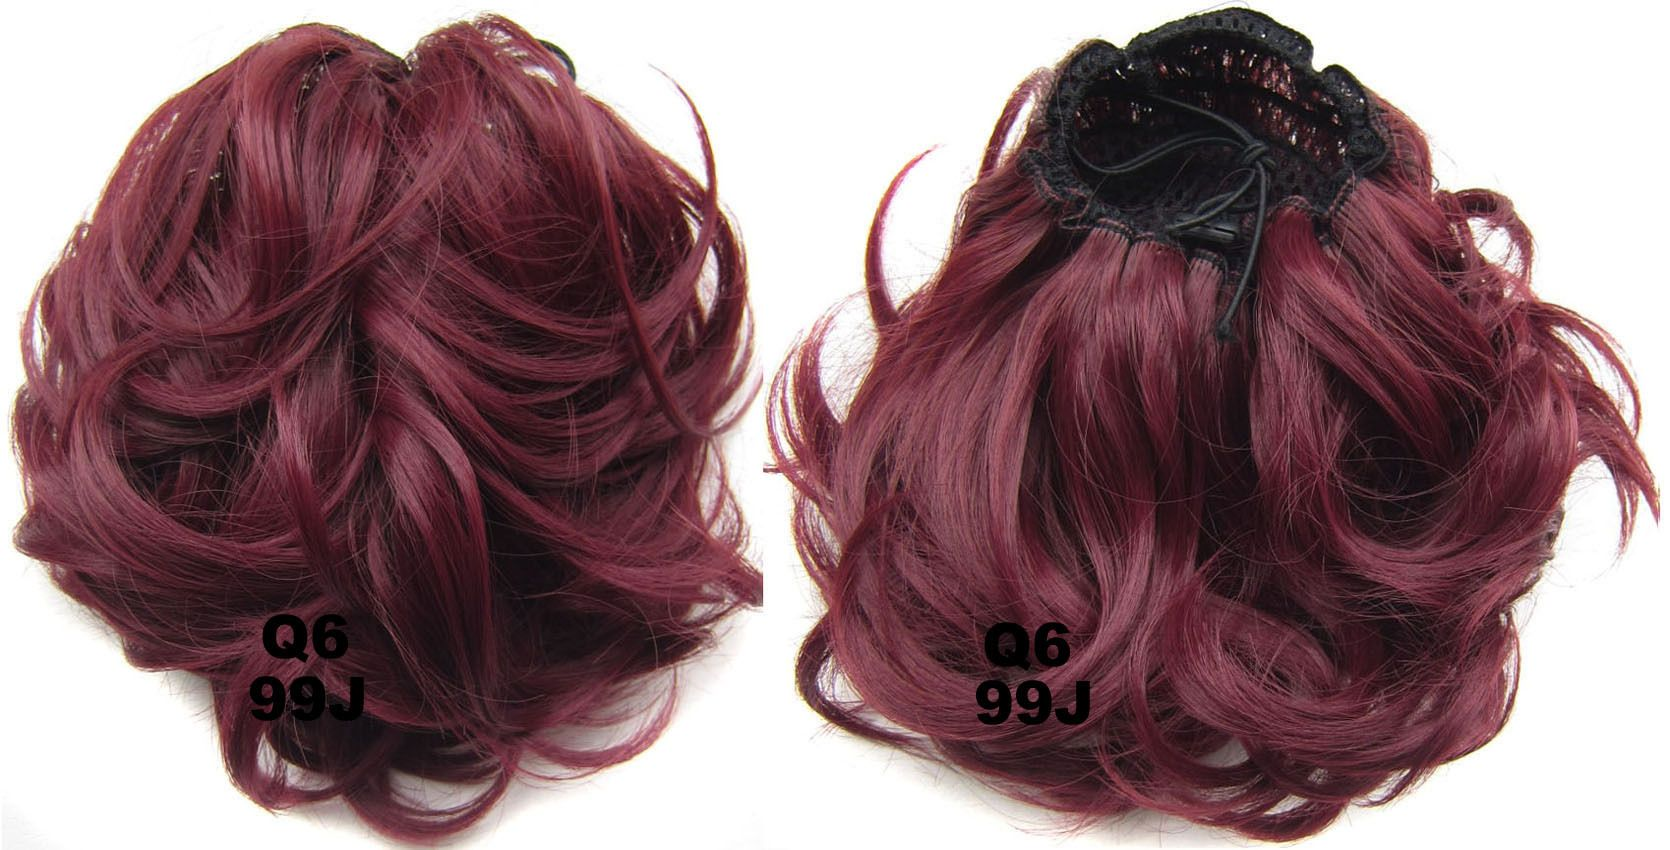 Ladies Elaborate Good Quality Curly And Short Hair Buns Drawstring